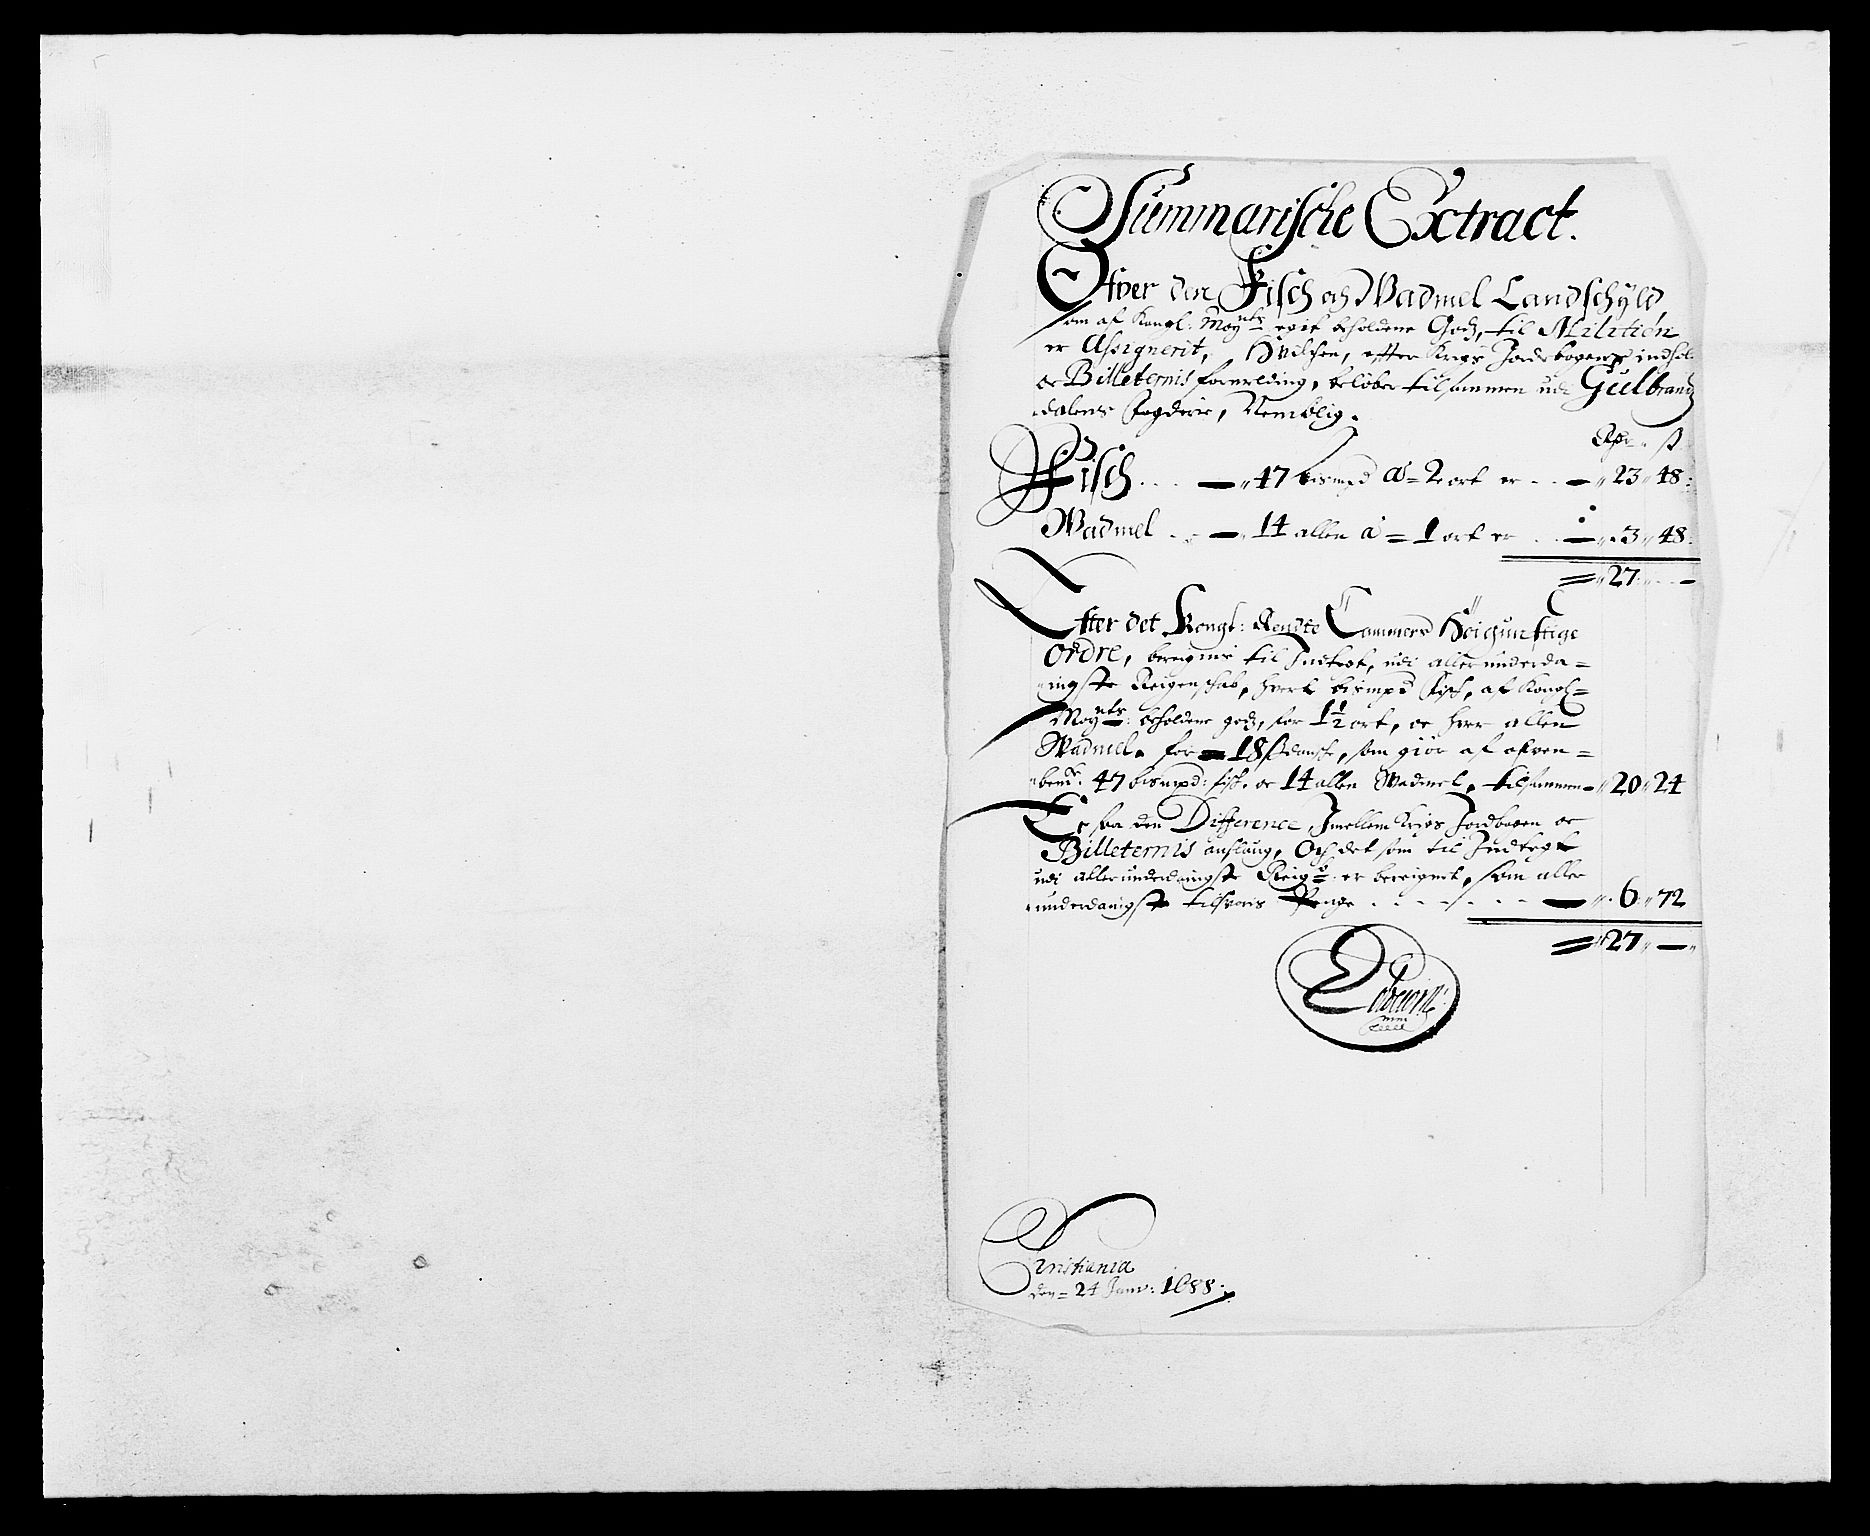 RA, Rentekammeret inntil 1814, Reviderte regnskaper, Fogderegnskap, R17/L1162: Fogderegnskap Gudbrandsdal, 1682-1689, s. 301